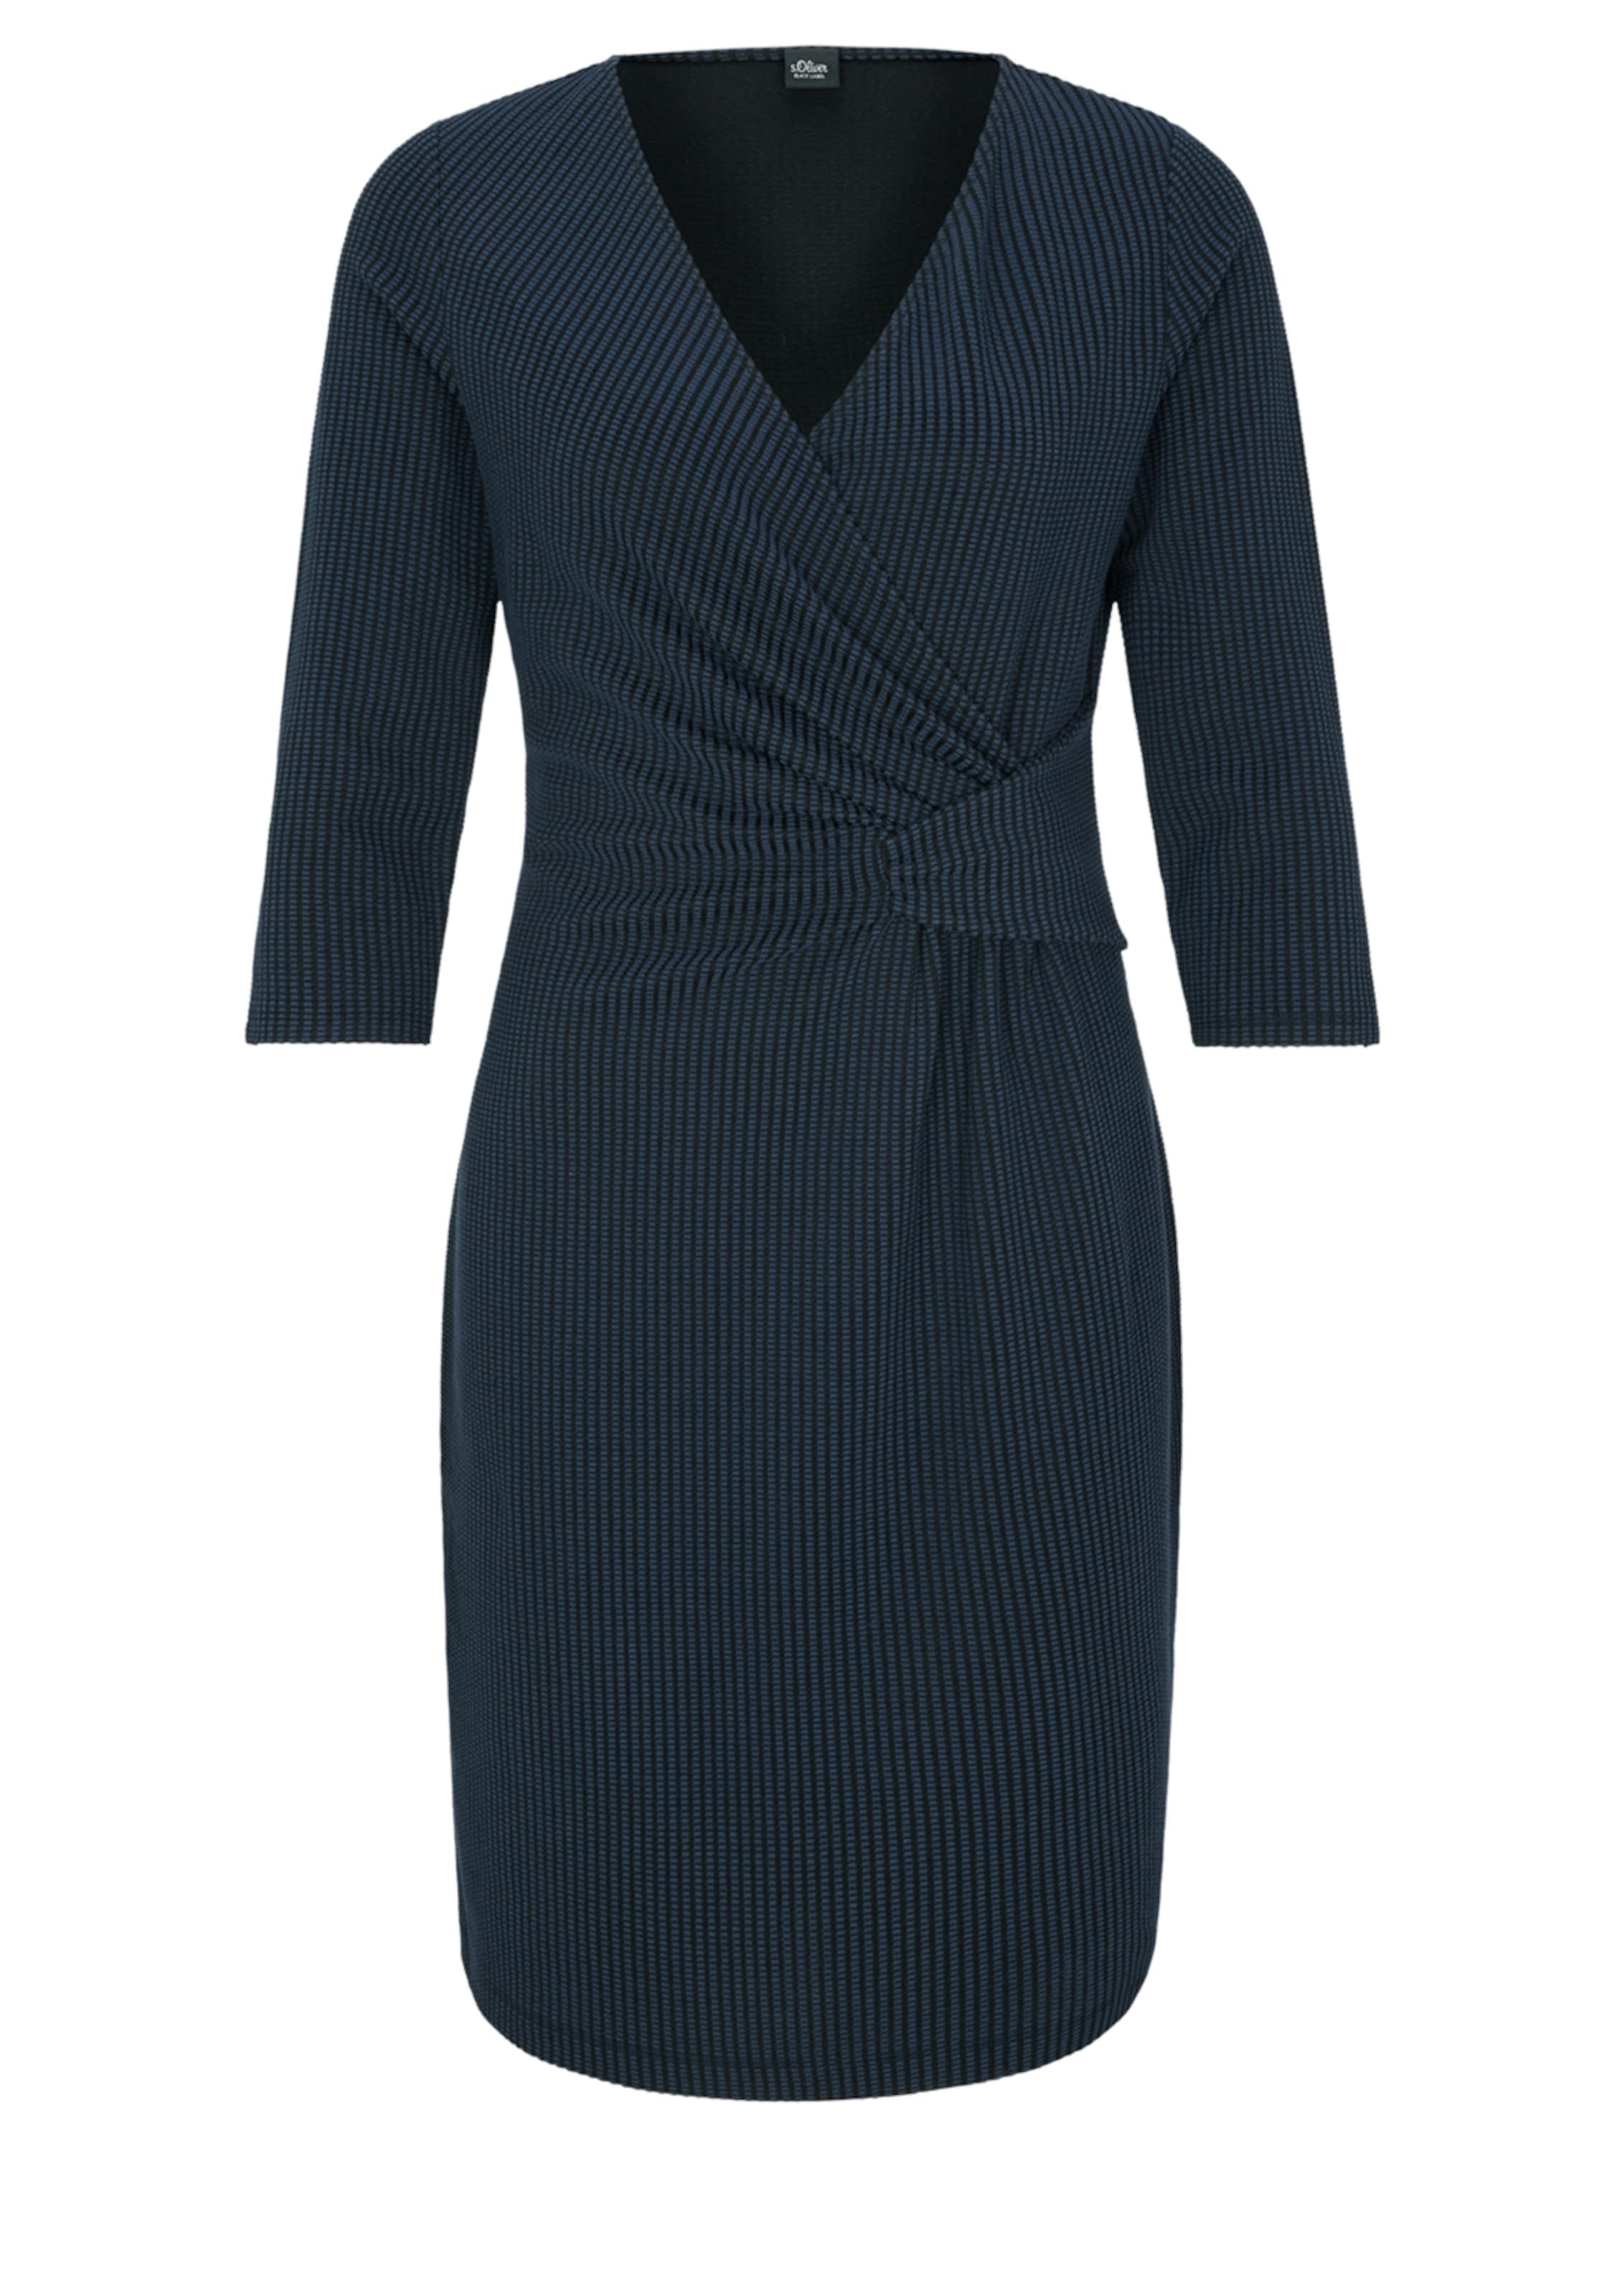 Kleid Black In NachtblauDunkelblau Label oliver S dWrBoxCe